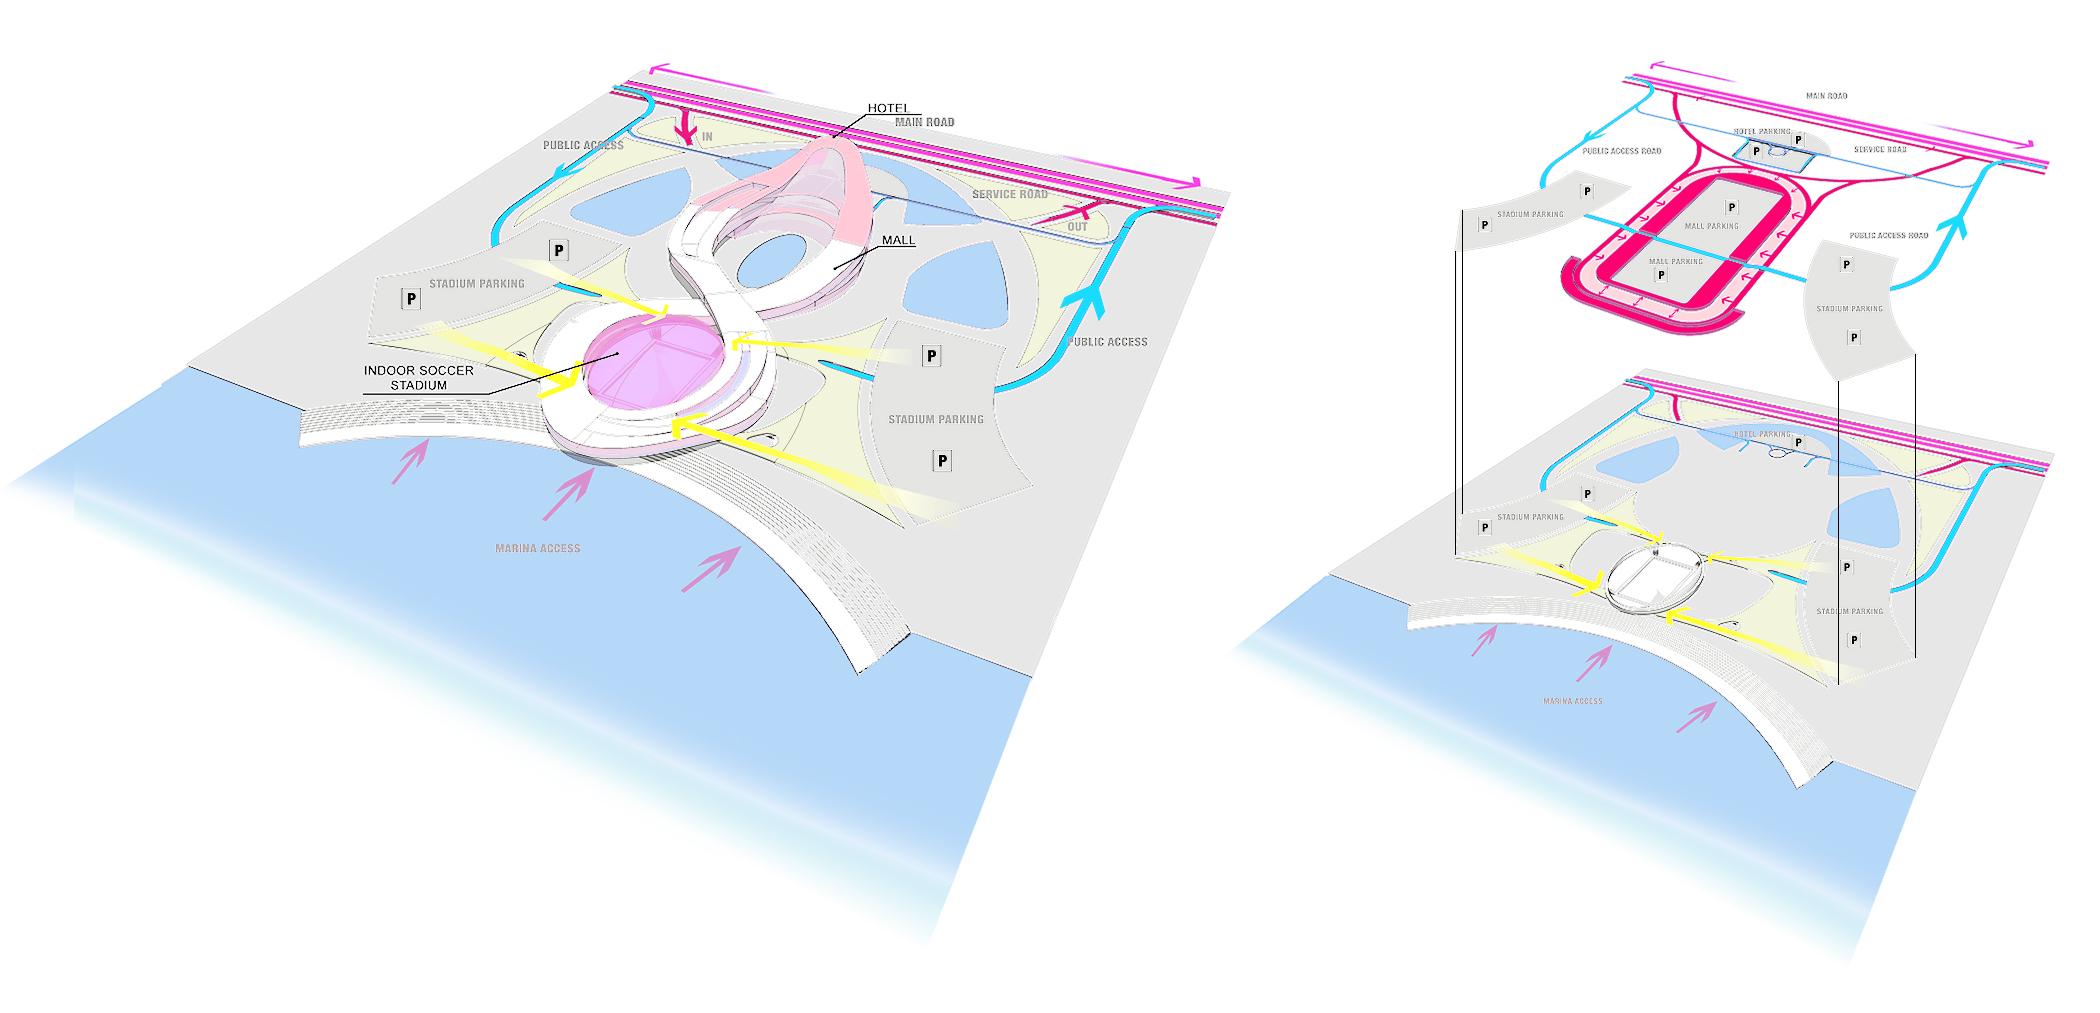 BEAD mall stadium diagram.JPG